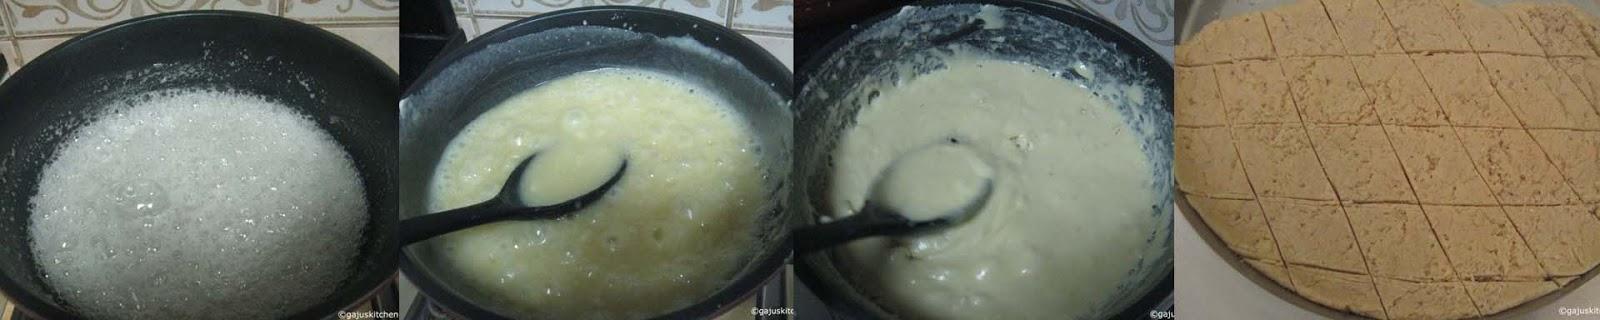 Badam cake preparation